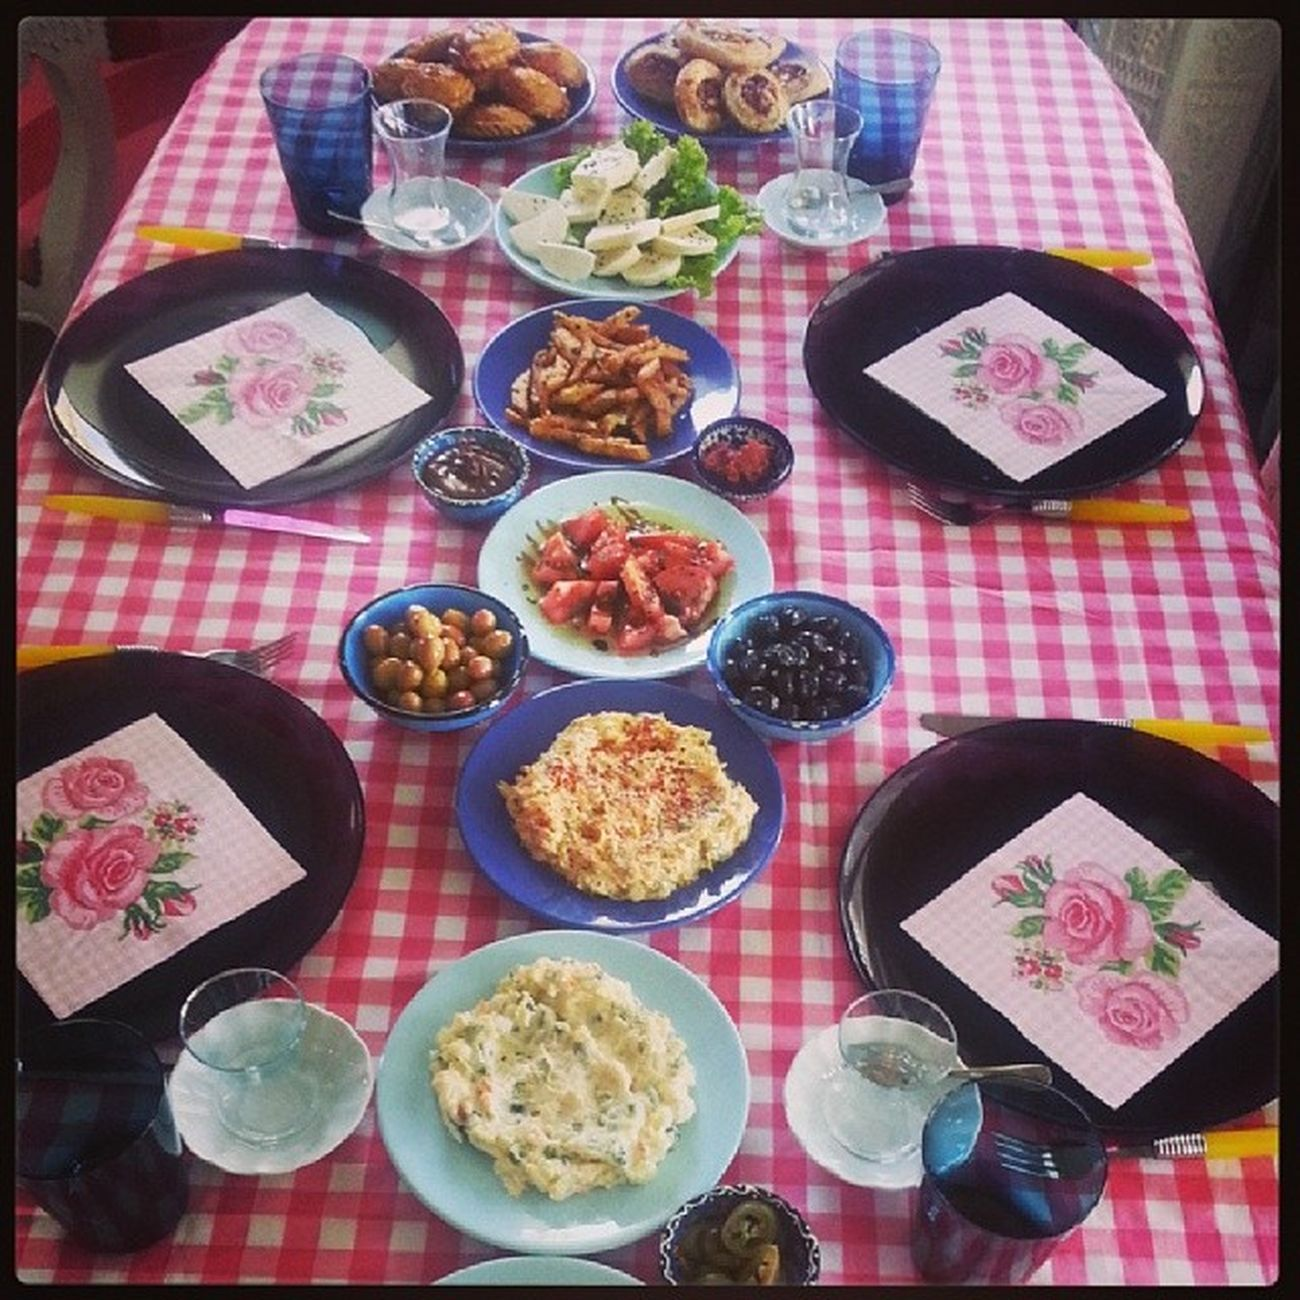 Süpriz misafir gelince yeniden kahvaltı hazırlanır :)) Instalike Instagood Instafood Instakahvaltı kahvalti pastalinmutfagi pastalinphotography